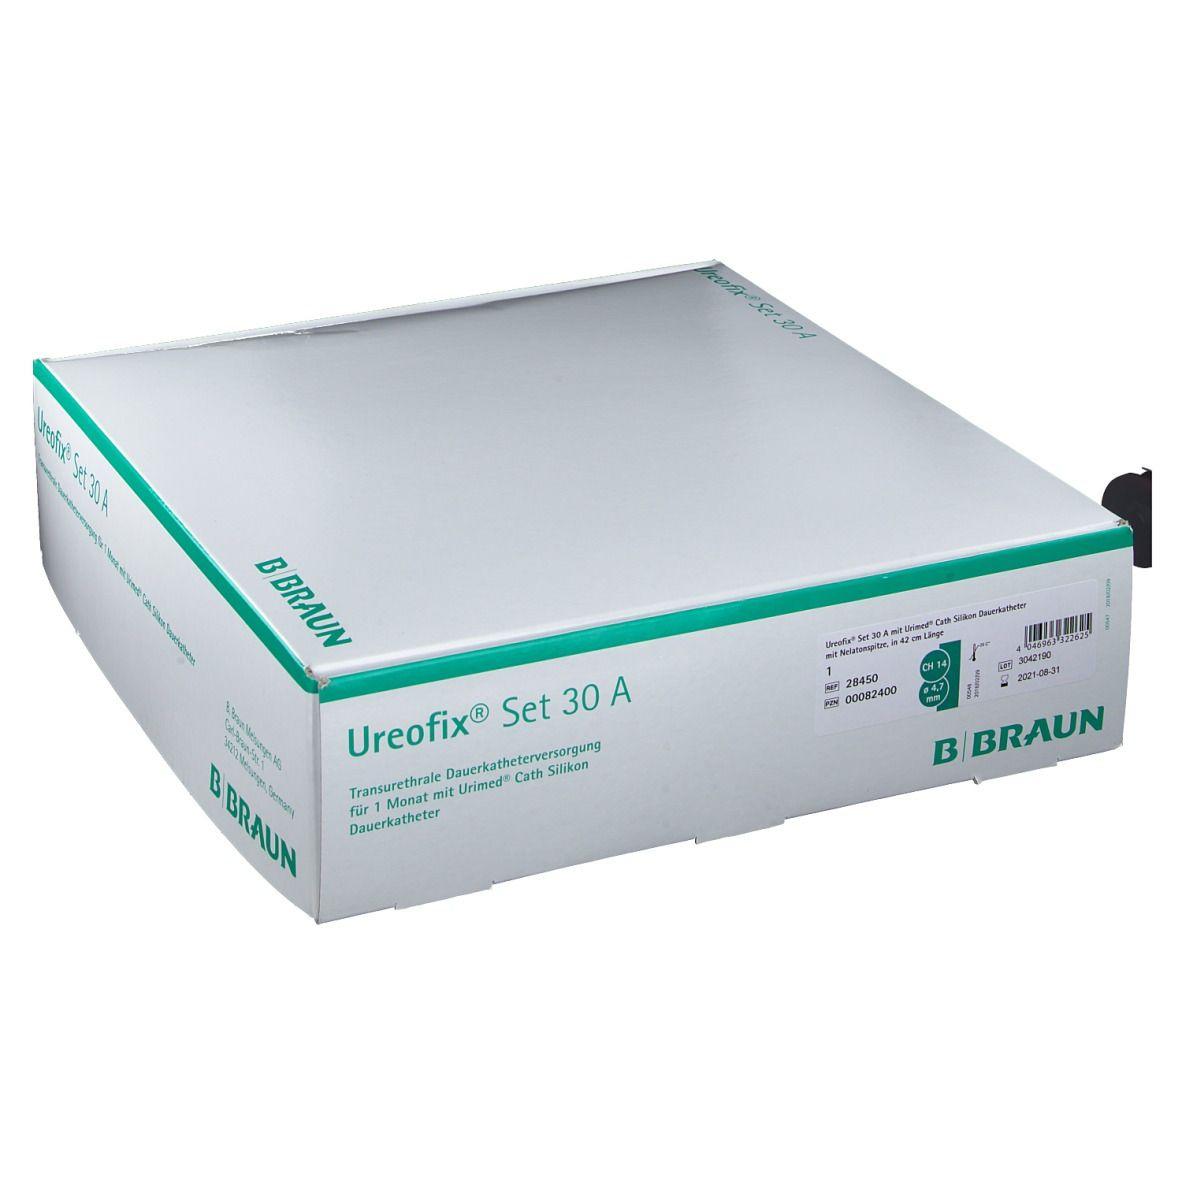 Ureofix® Ballonkathete Silikon Ch 14 Set